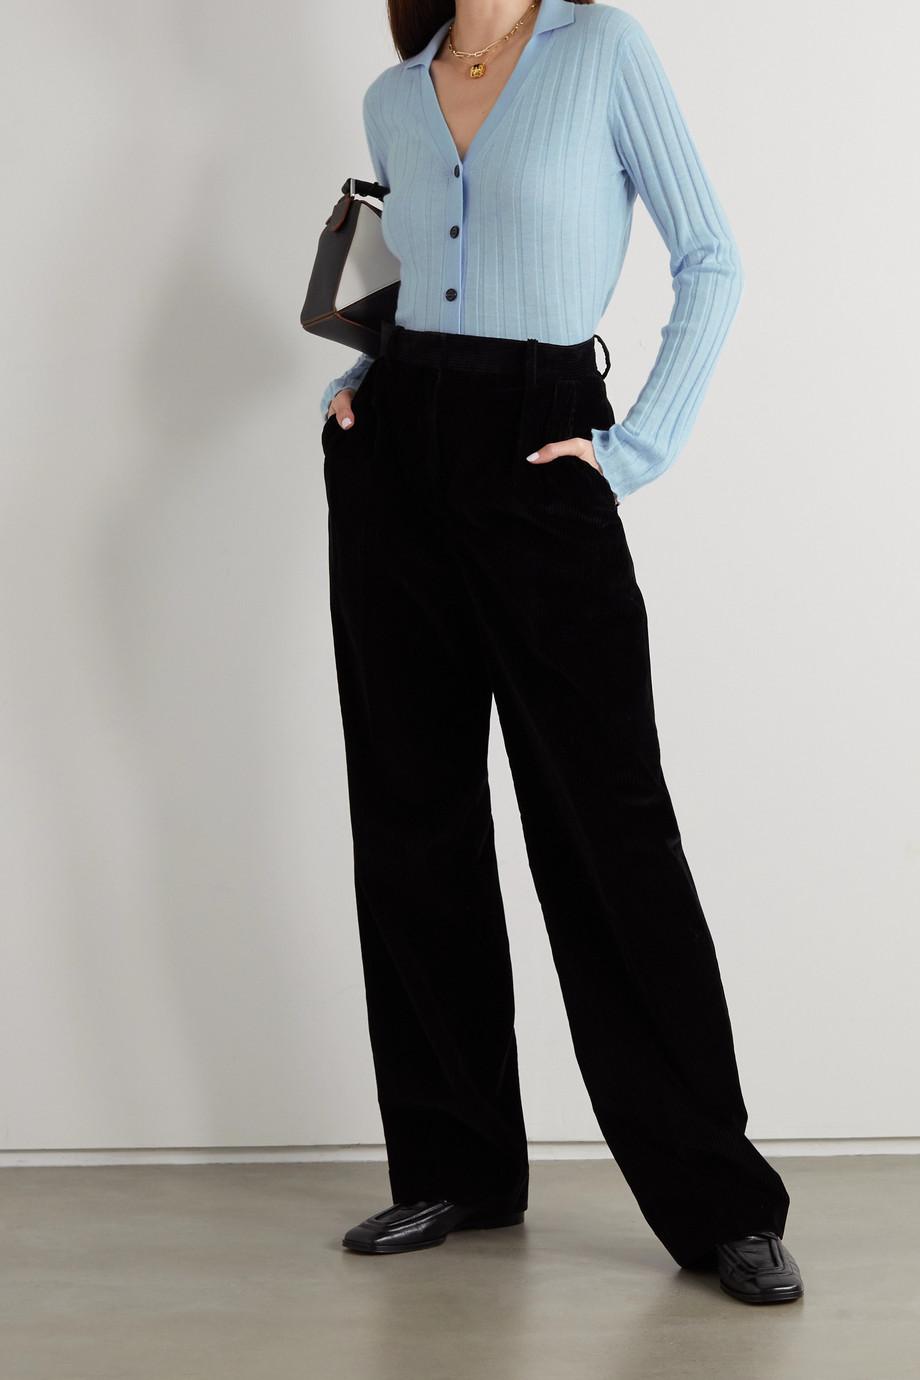 Lisa Yang Indya ribbed cashmere cardigan